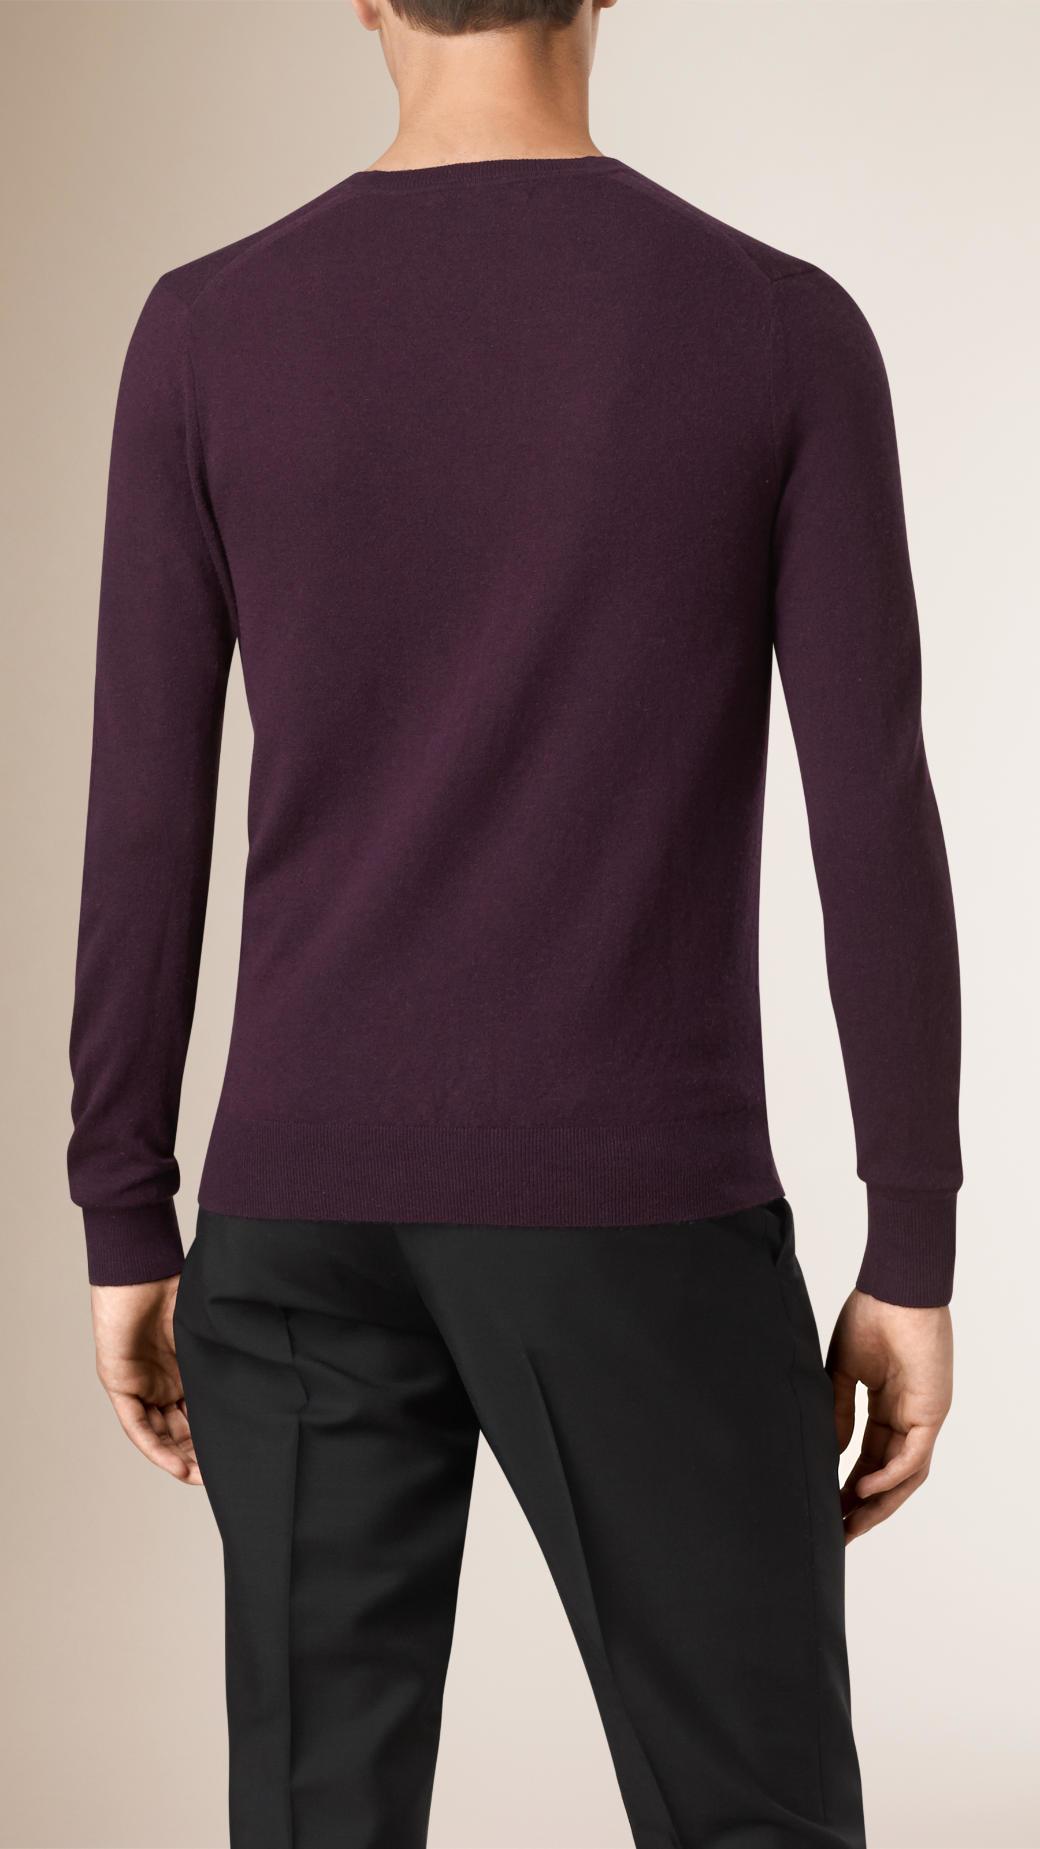 Burberry Cashmere V-neck Sweater Burgundy Black in Purple for Men ...